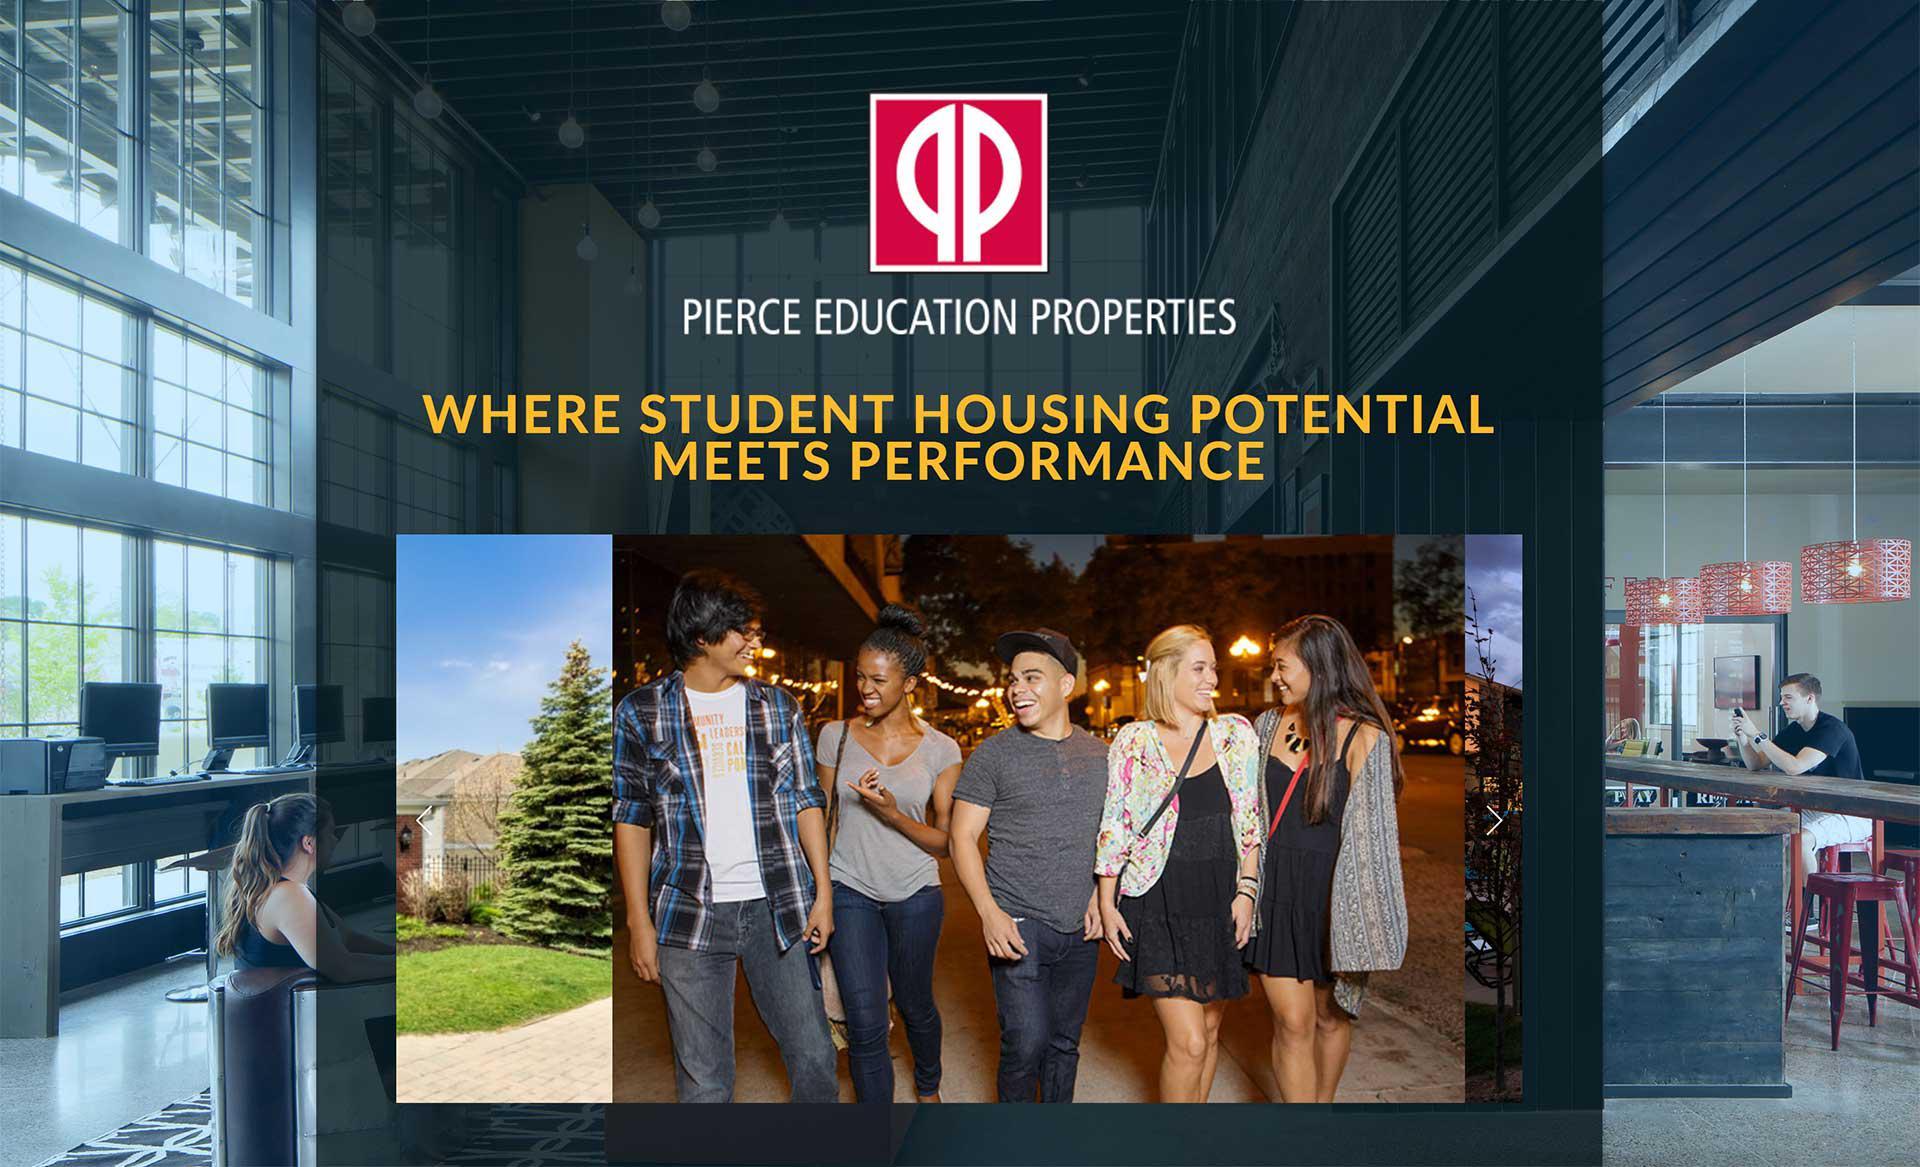 Pierce Education Properties